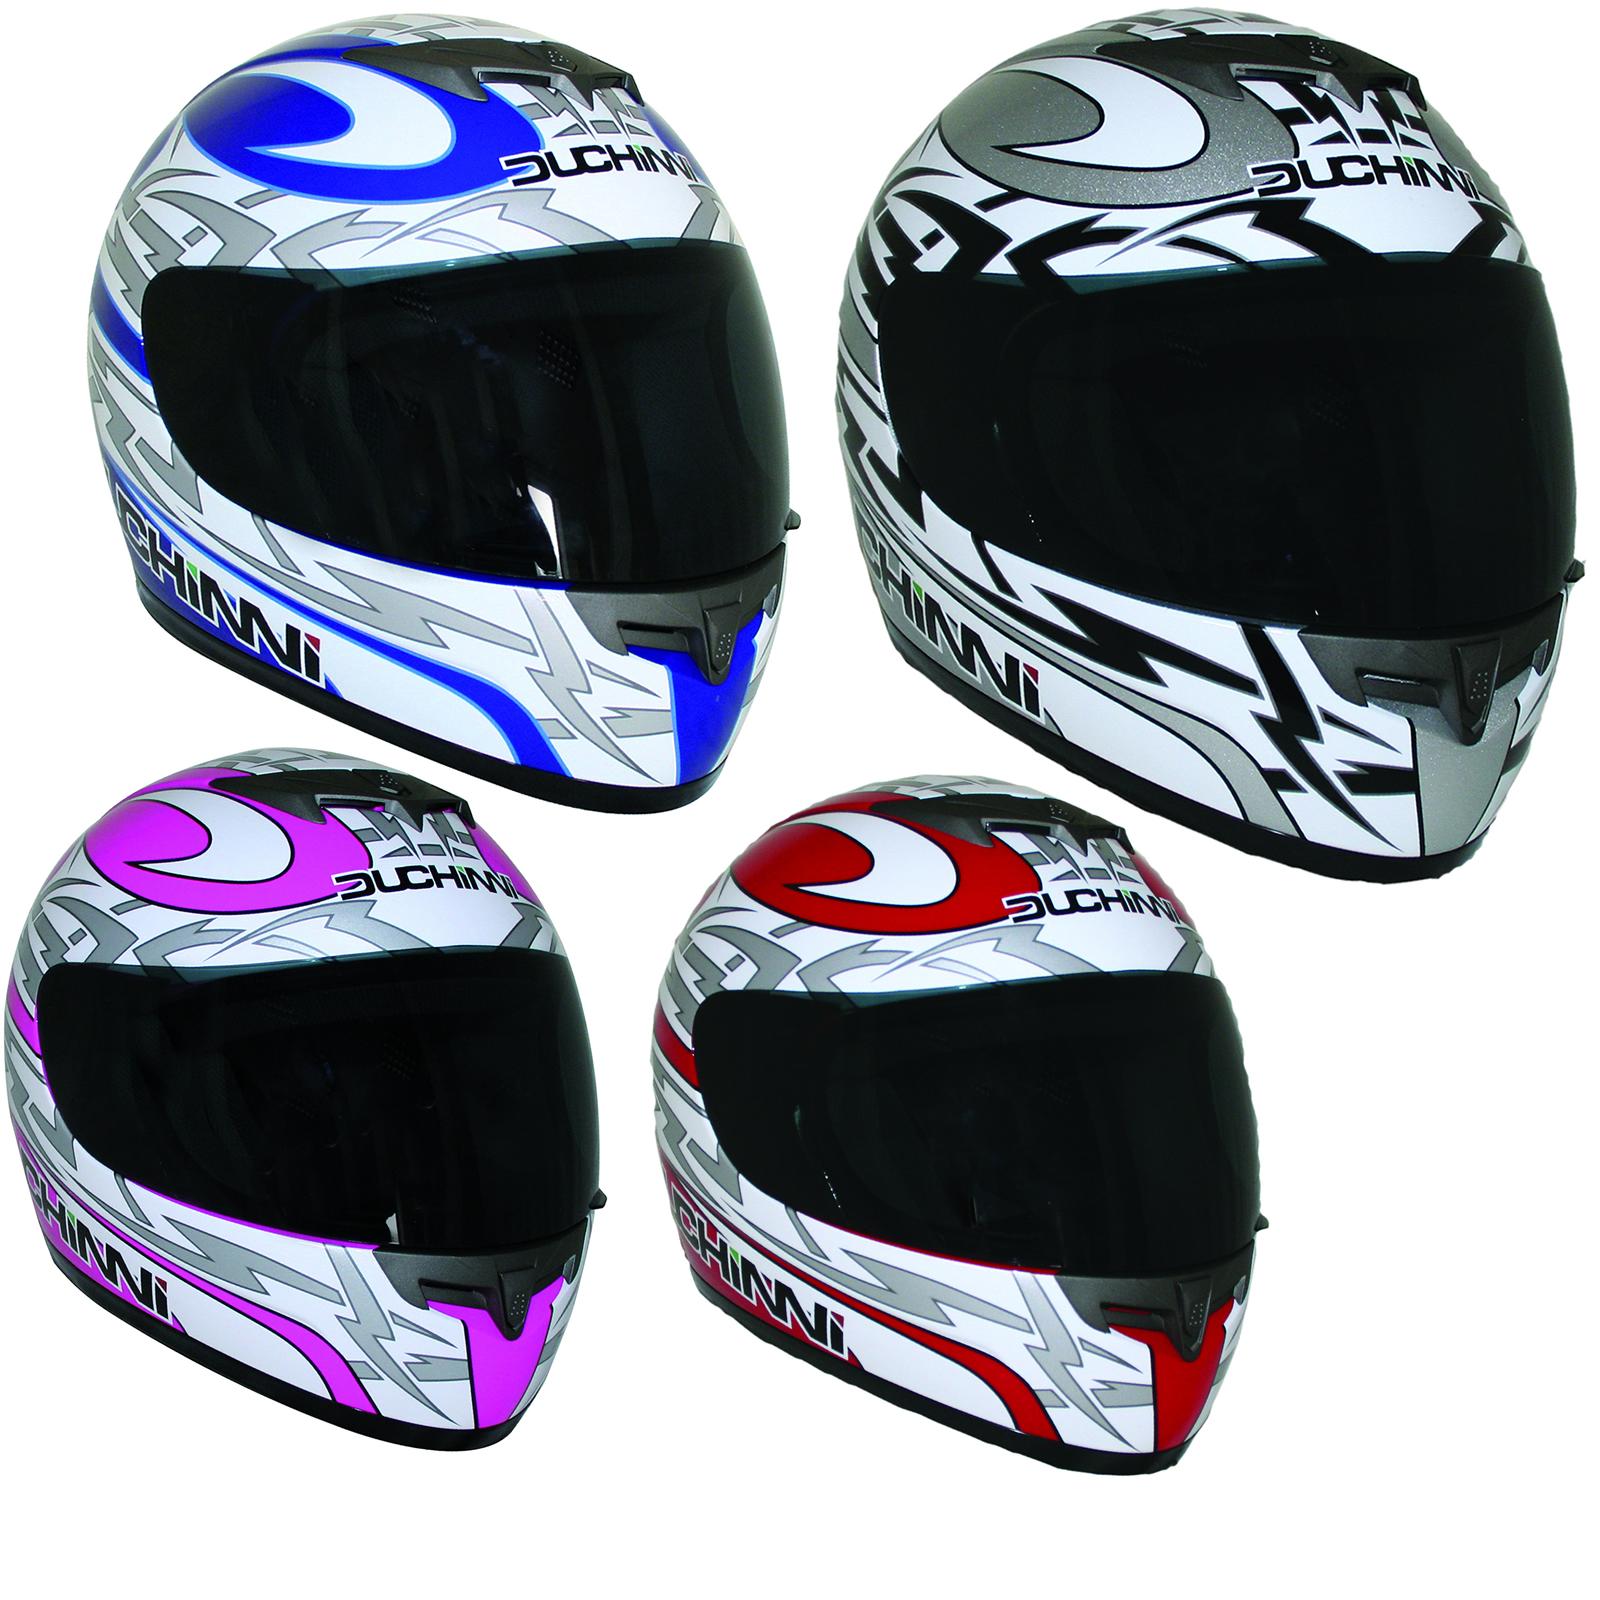 Duchinni D101 Tribal Motorcycle Helmet Full Face Helmets  : 11265 Duchinni D101 Tribal Motorcycle Helmet 0 <strong>Suzuki</strong> Motorcycle Helmets from www.ghostbikes.com size 1600 x 1600 jpeg 1335kB